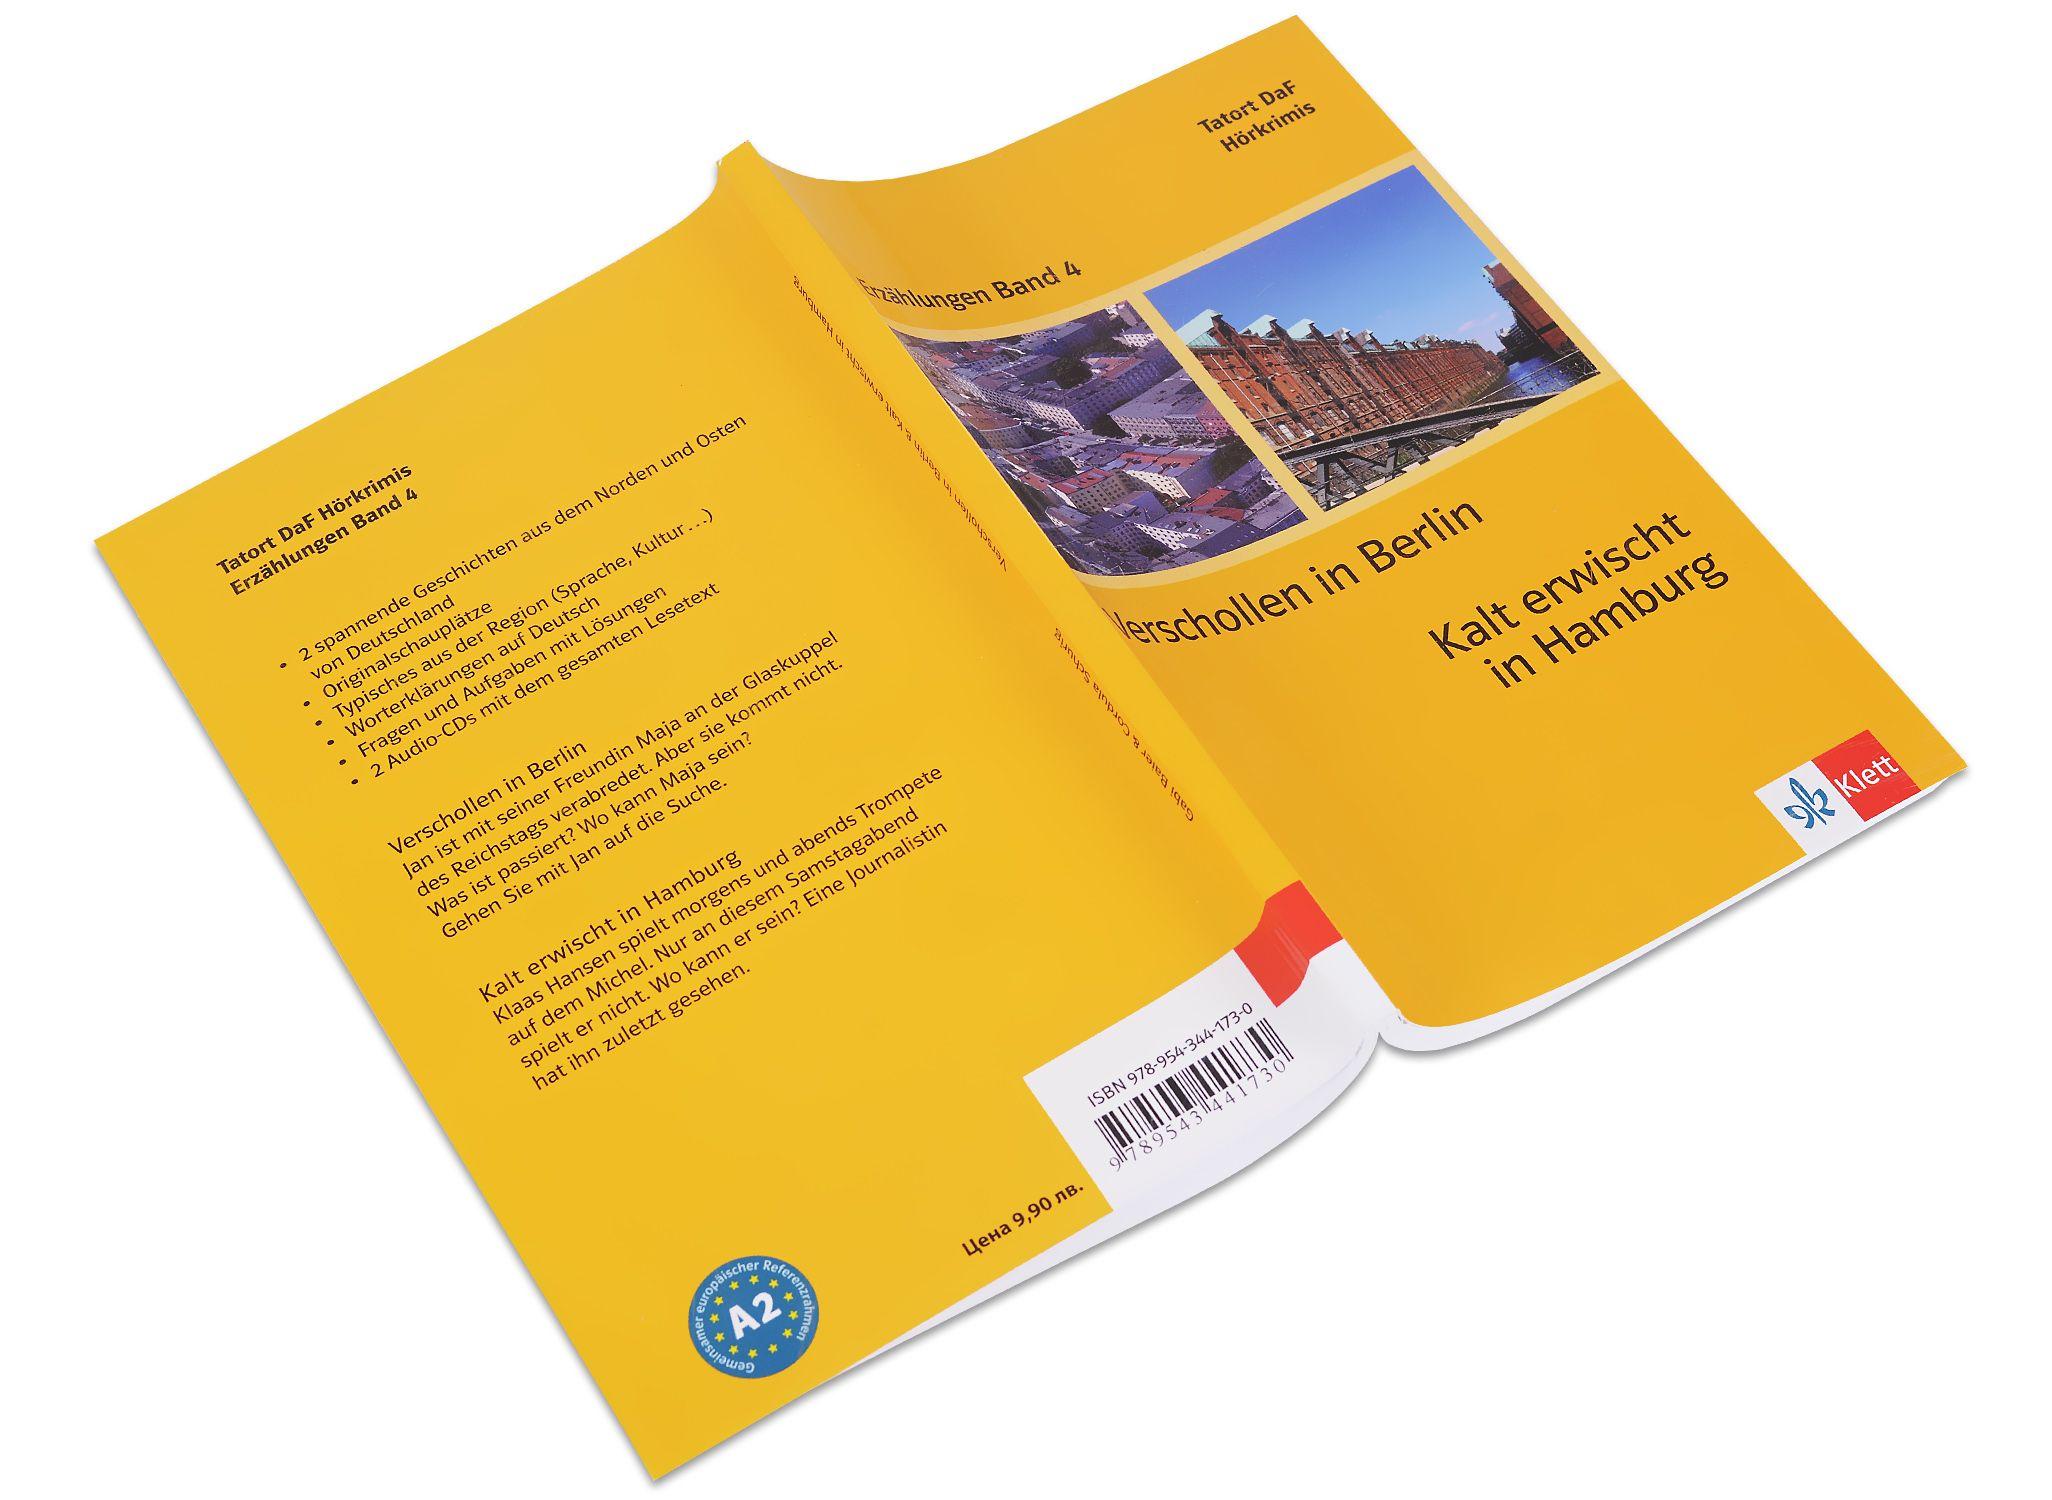 Erzählungen Band 4: Verschollen in Berlin & Kalt erwischt in Hamburg - ниво А2 (Адаптирано издание: Немски) - 4